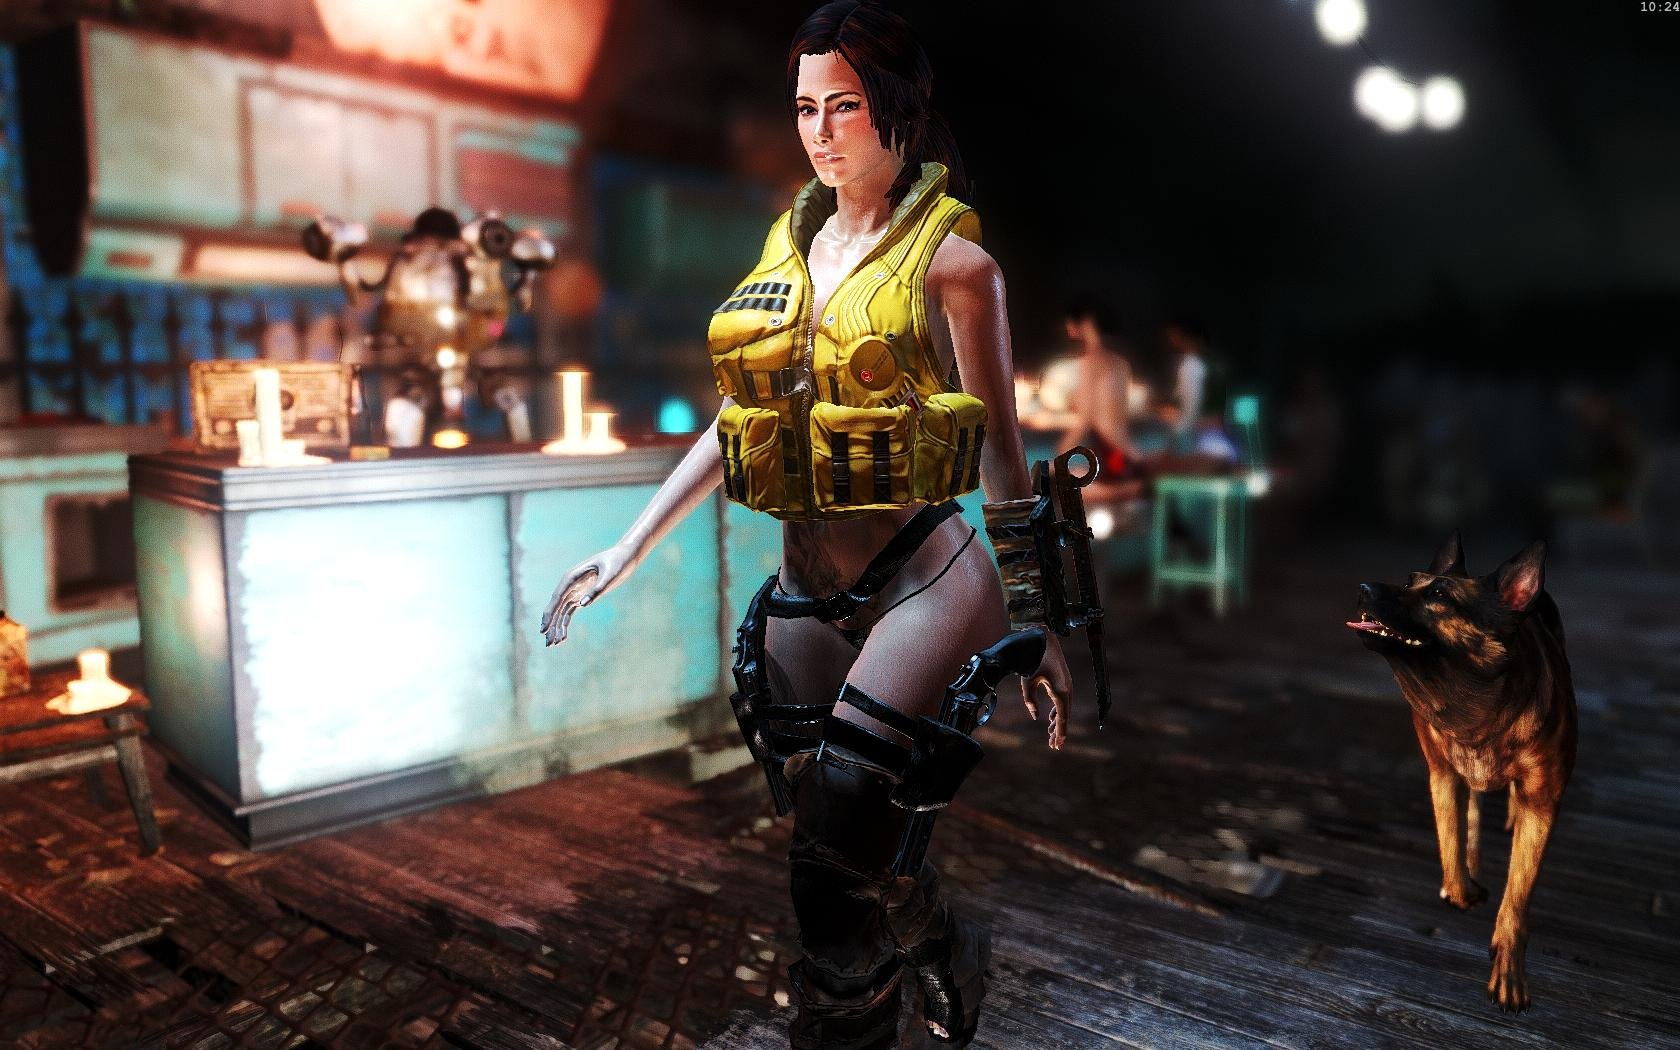 Fallout4 2019-03-25 10-24-49-34